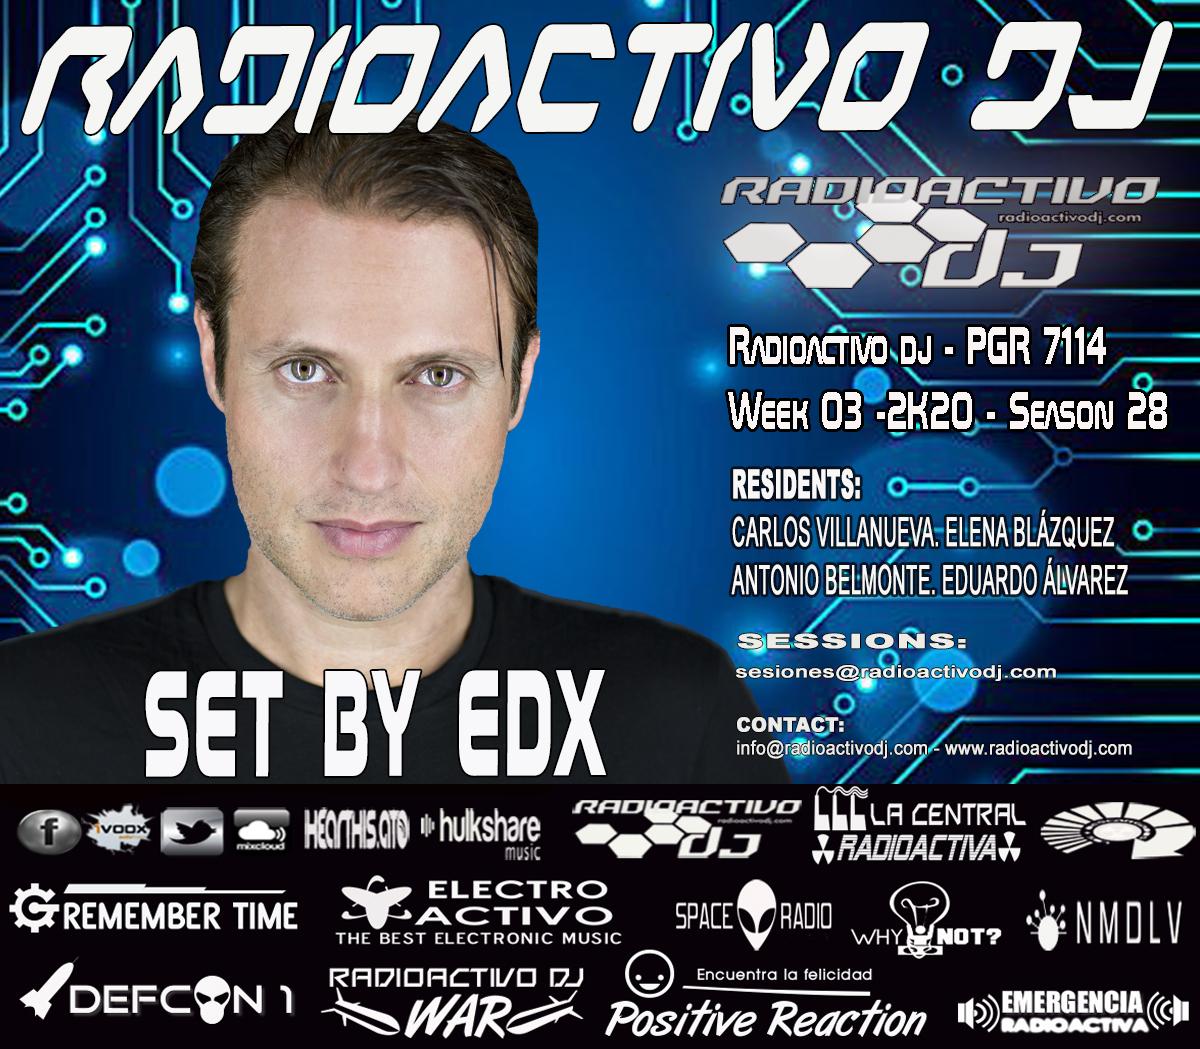 RADIOACTIVO-DJ-03-2020